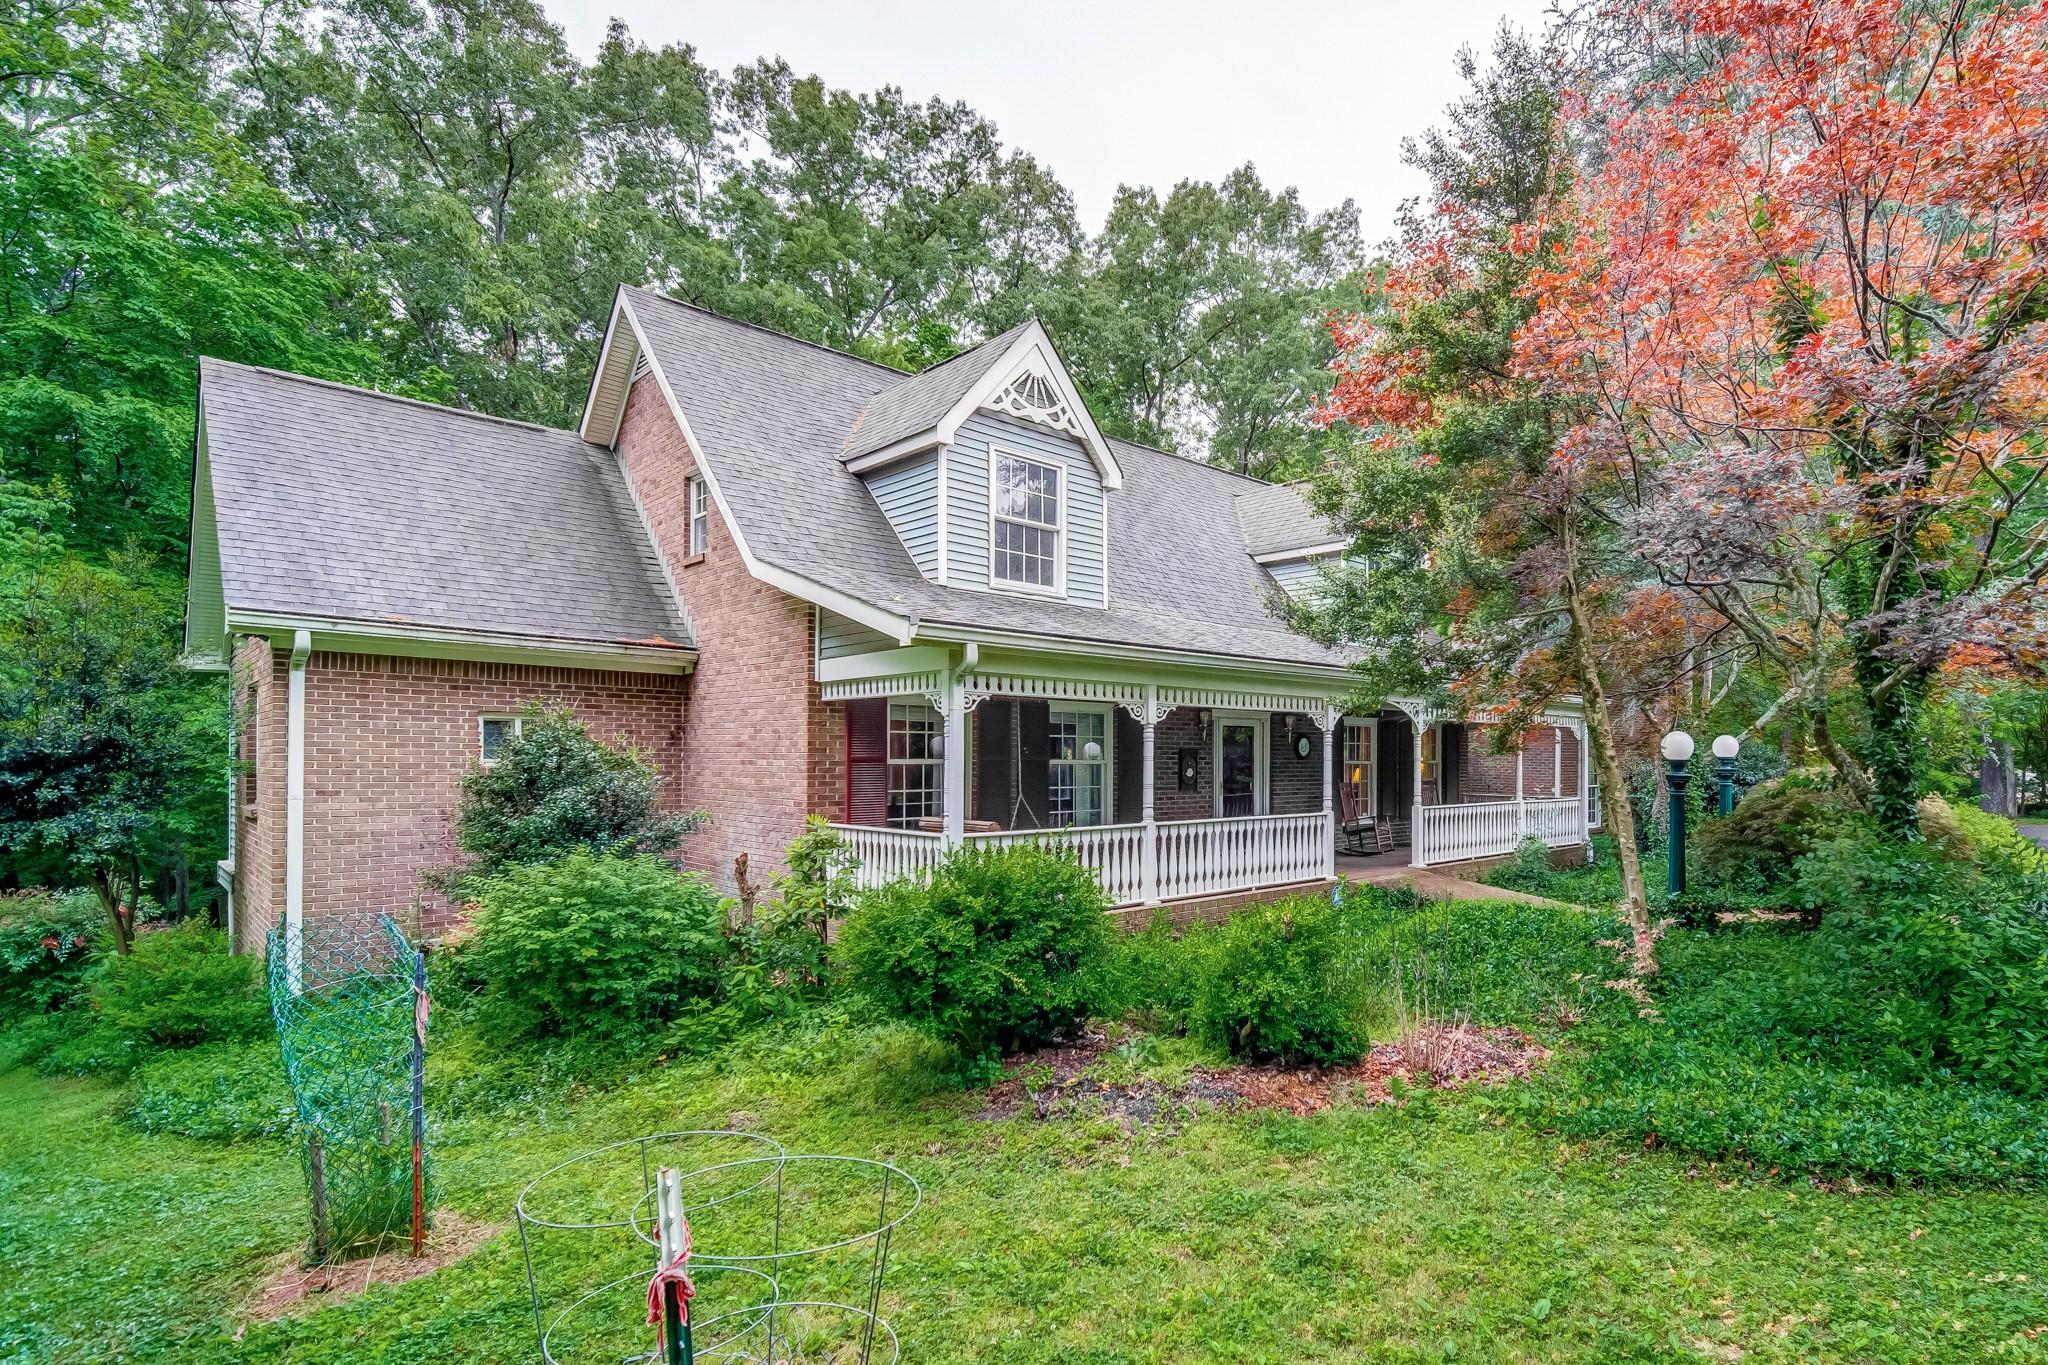 107 Christi Pl, Pleasant View, TN 37146 - Pleasant View, TN real estate listing